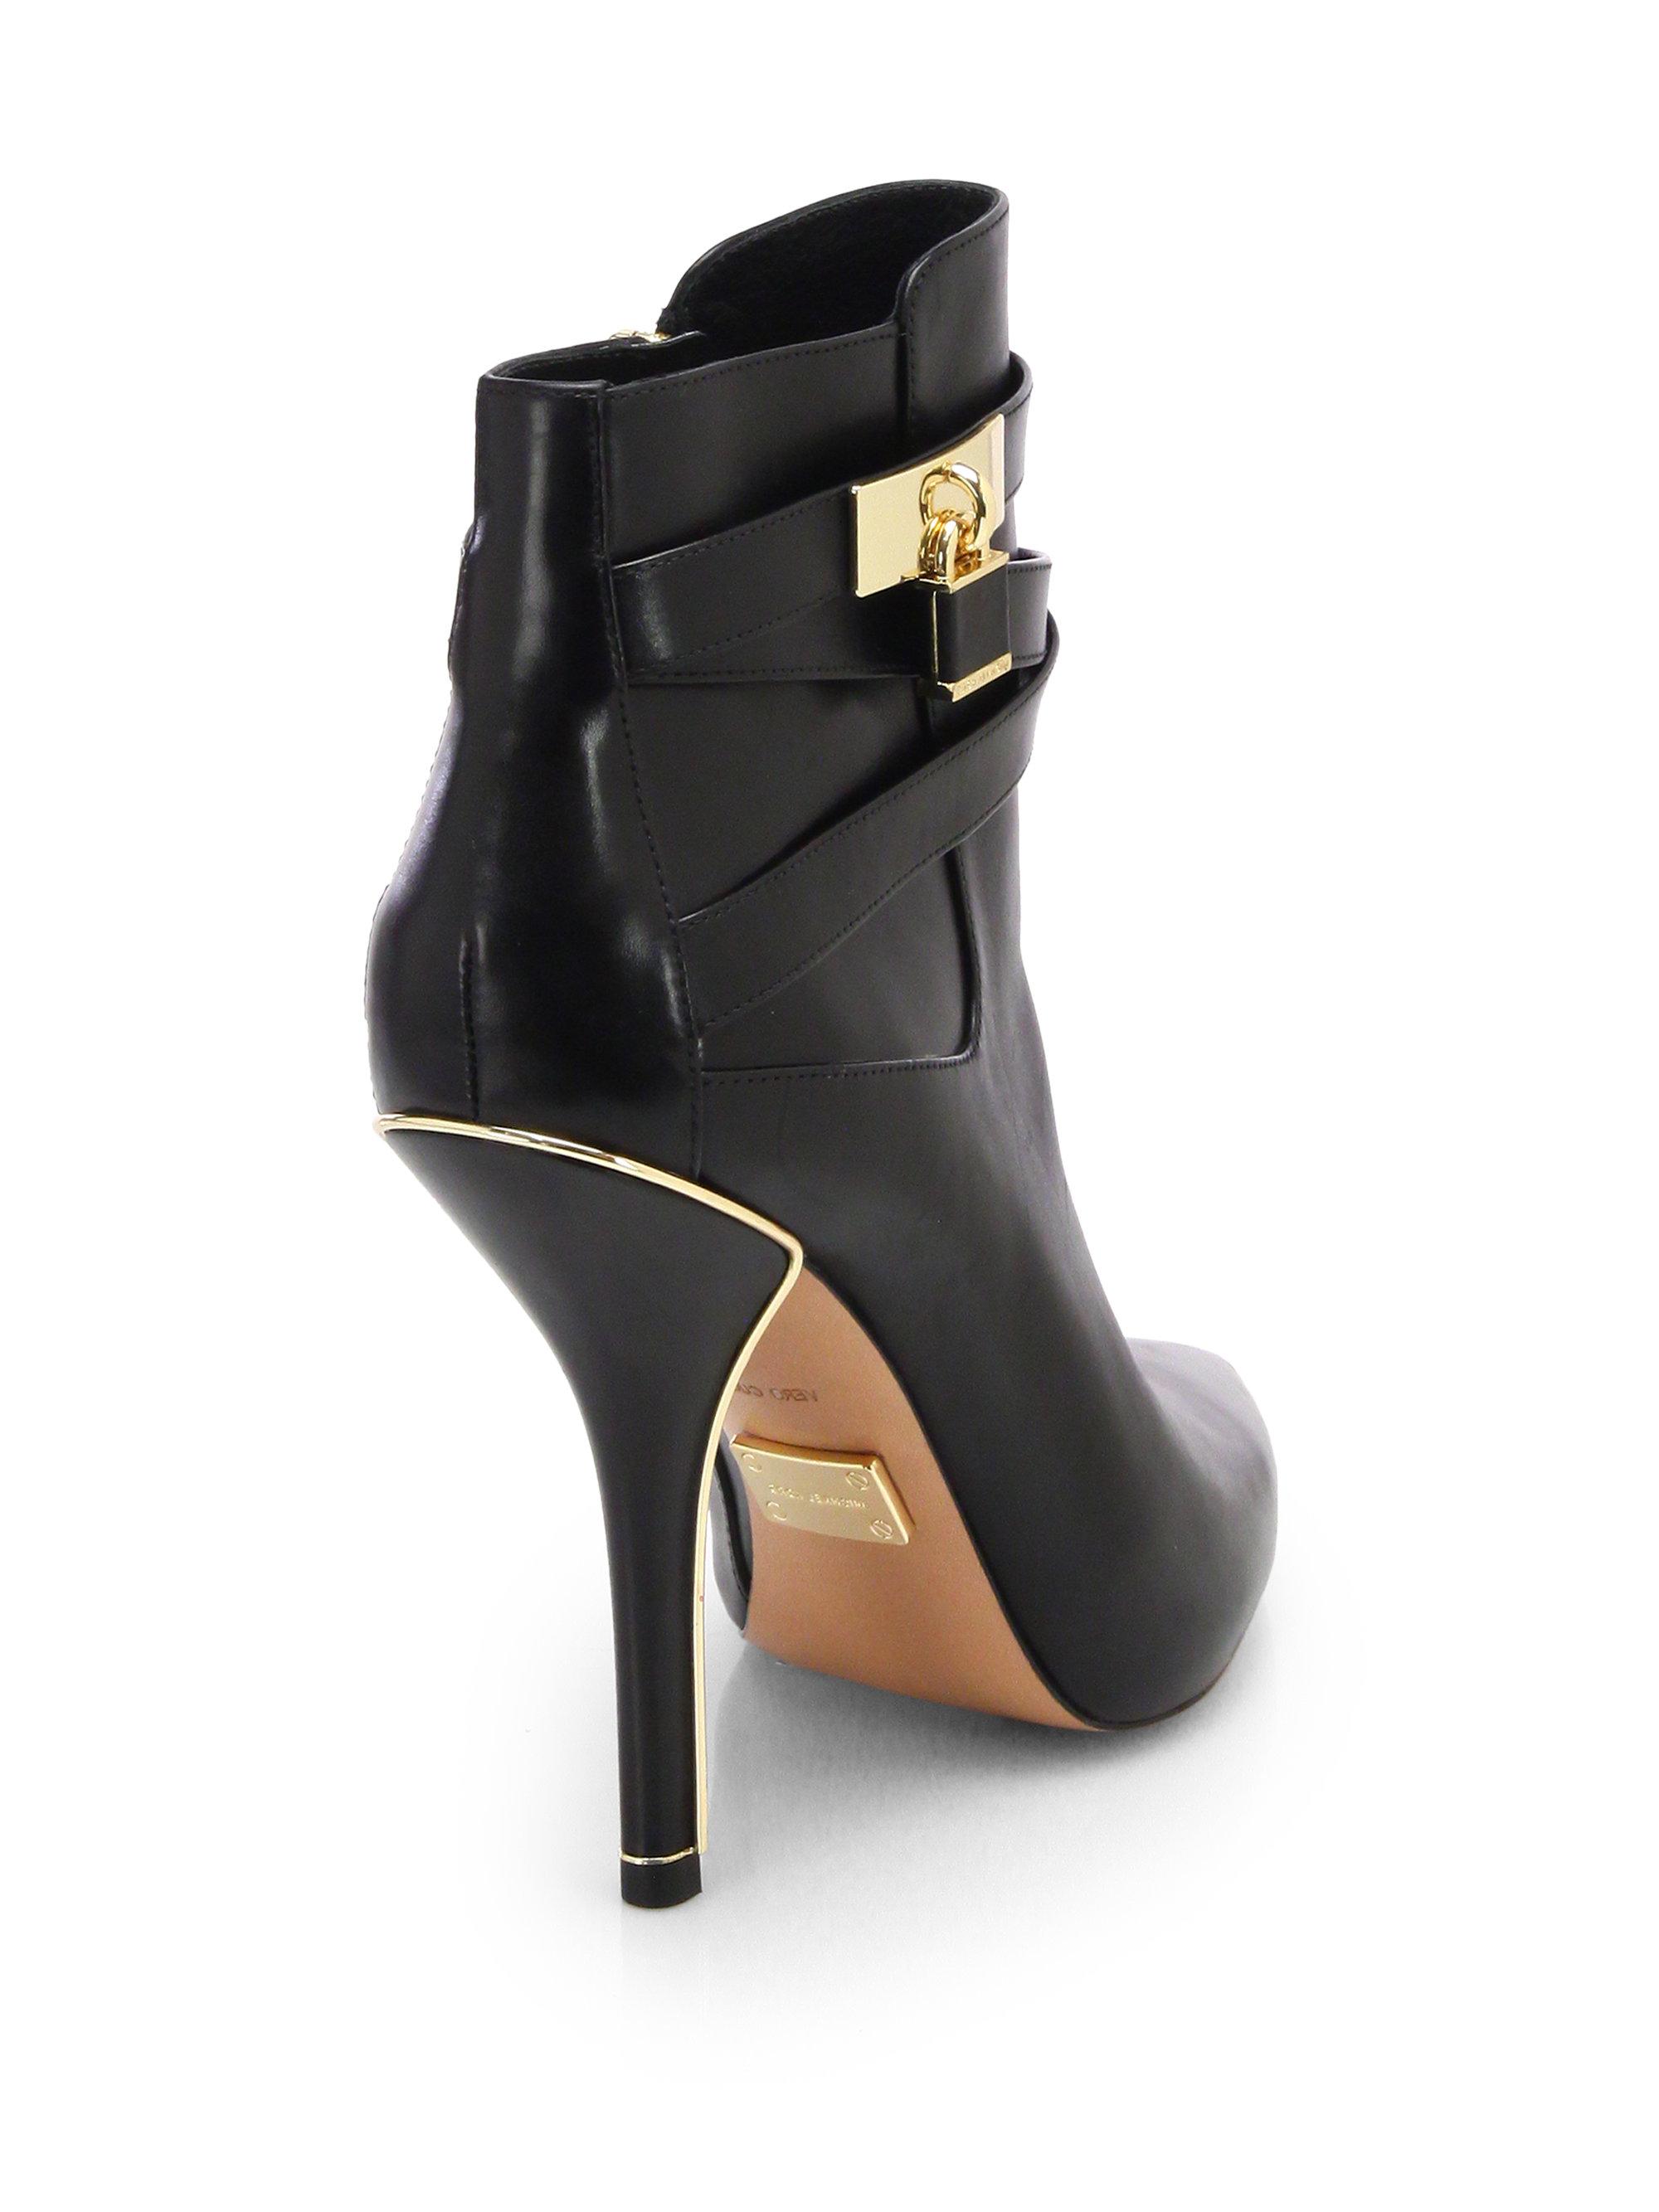 michael kors averie leather booties in black lyst. Black Bedroom Furniture Sets. Home Design Ideas